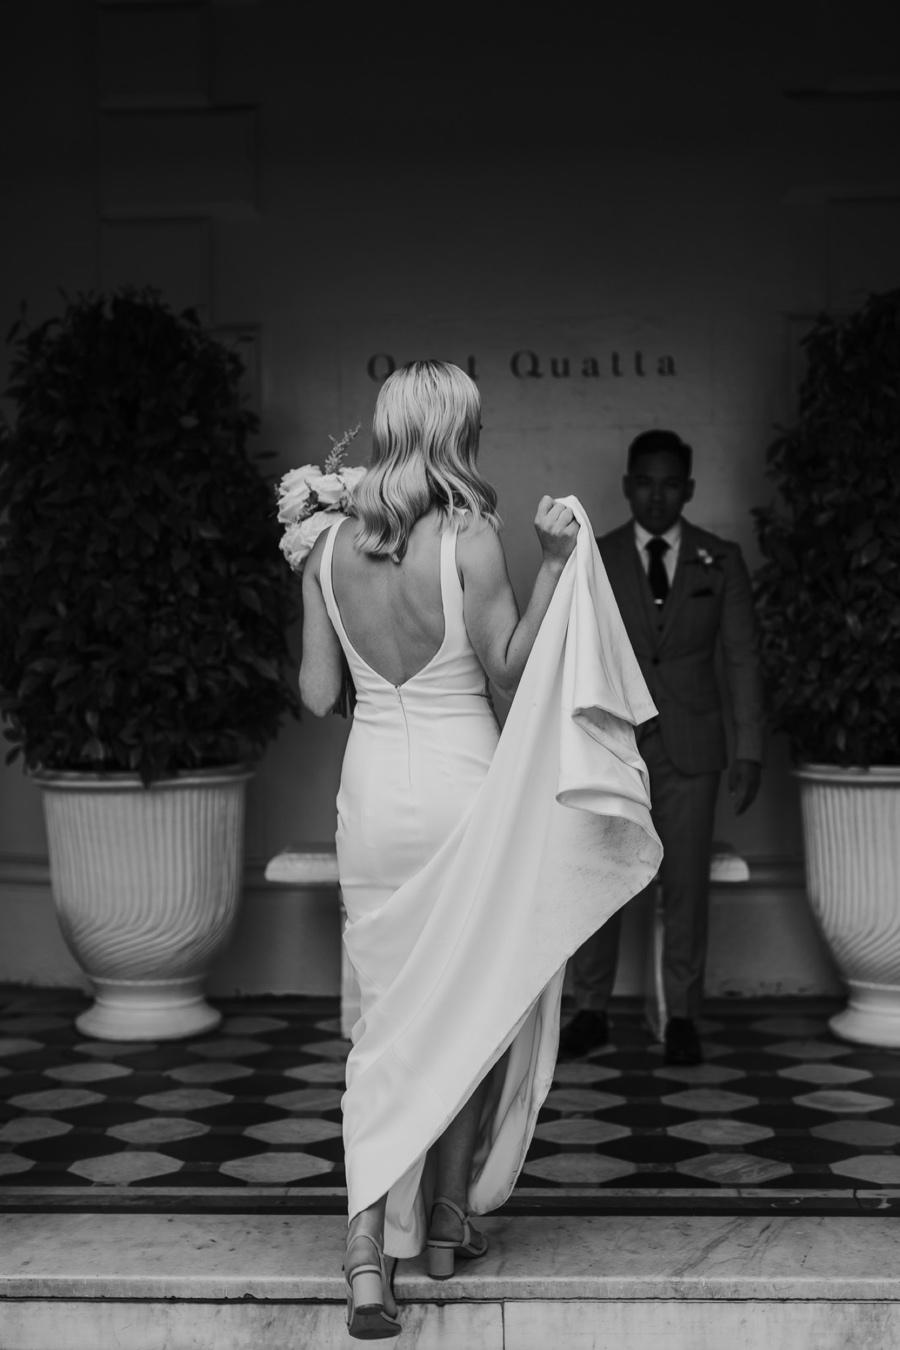 Quat Quatta Melbourne Wedding Photography76.jpg